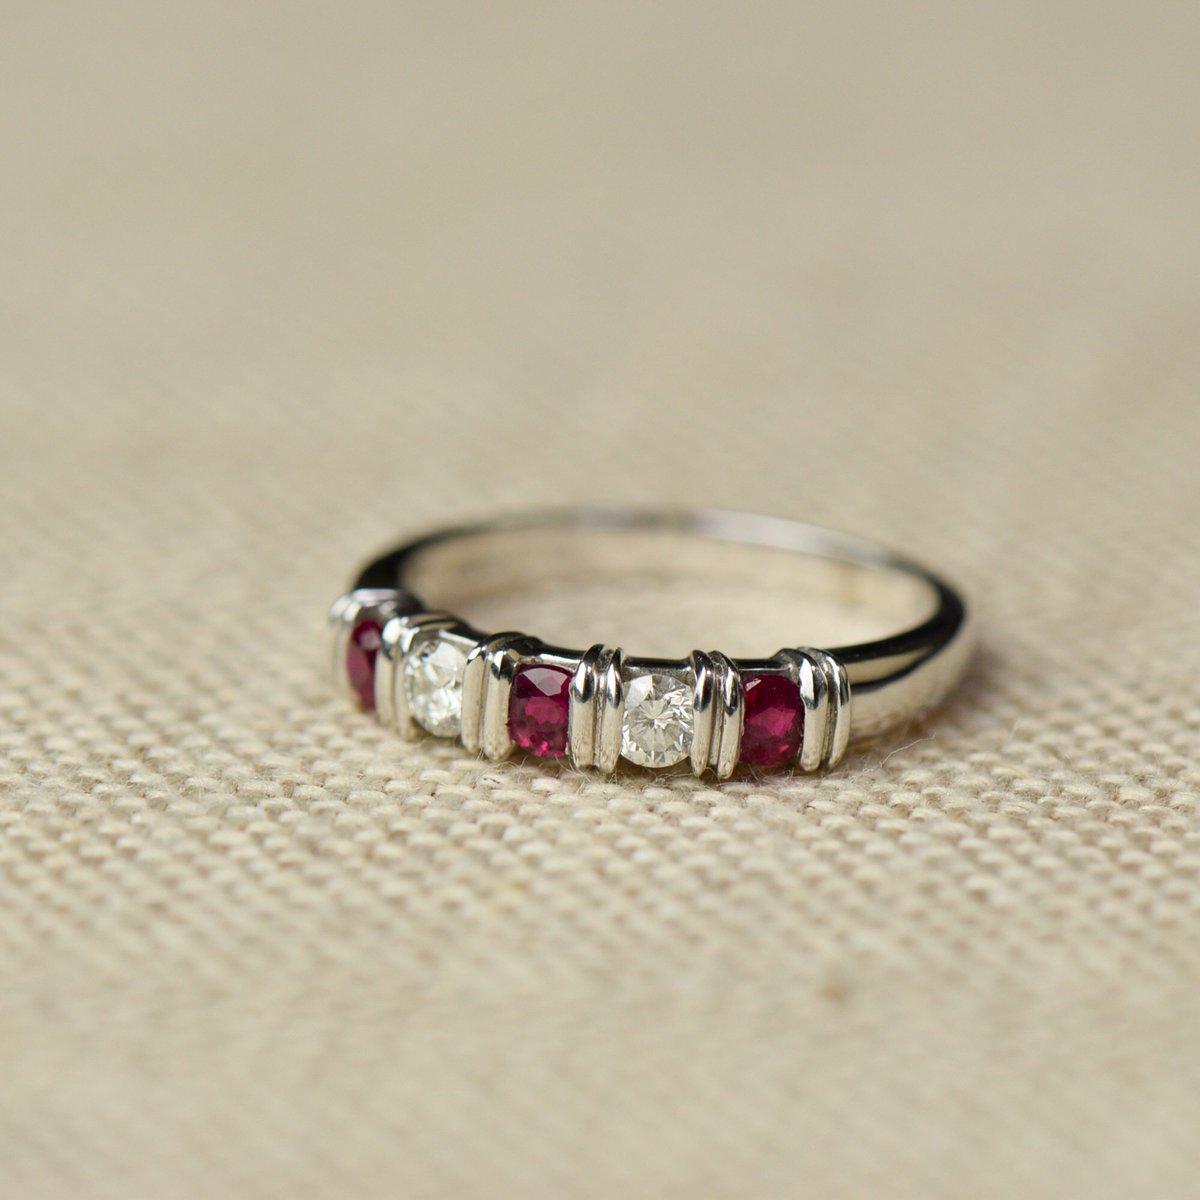 TImeless 14ct white gold ruby and diamond ring  #stalbanslife #stalbans #hertslife #shopstalbans #stalbansbusiness #london #londonfashion #londonjewellery #londonjewelry #instajewels #rubynecklace #rubiesanddiamonds #vintagejewellery #vintagejewelry #makeityours #shopinstorenowpic.twitter.com/vyn9JggUGI